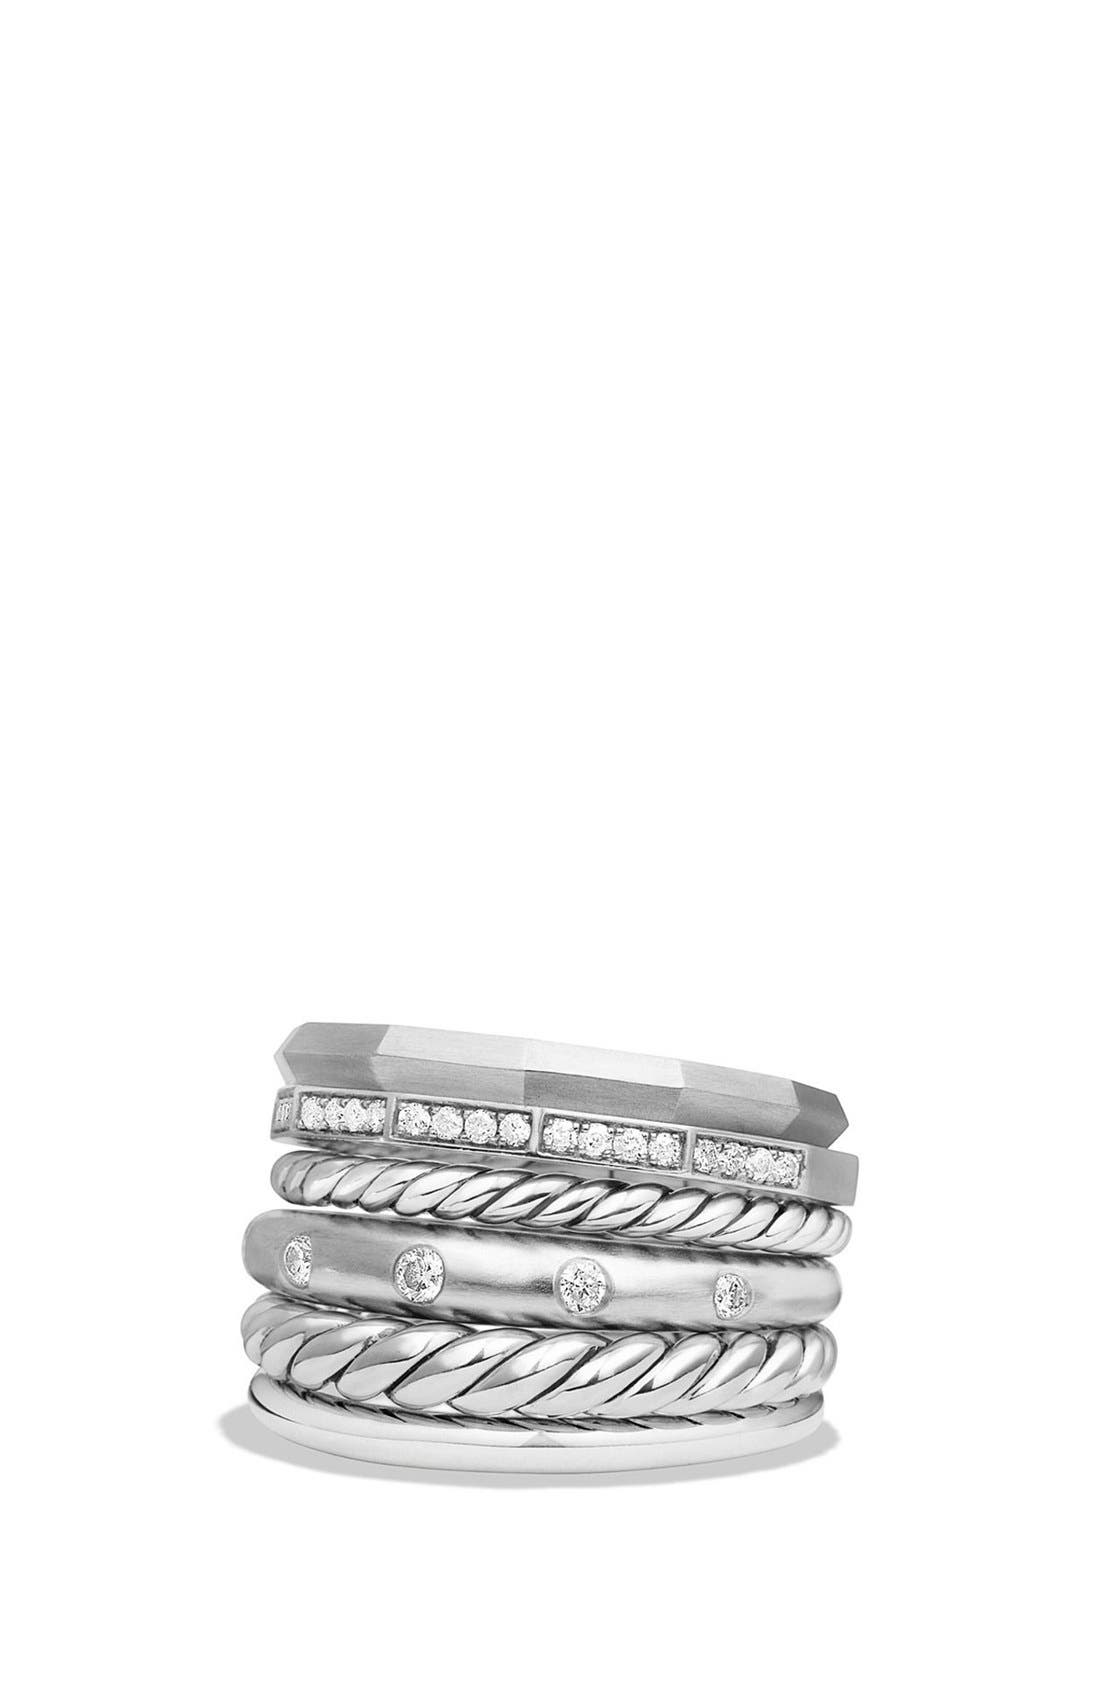 David Yurman 'Stax' Wide Diamond Ring